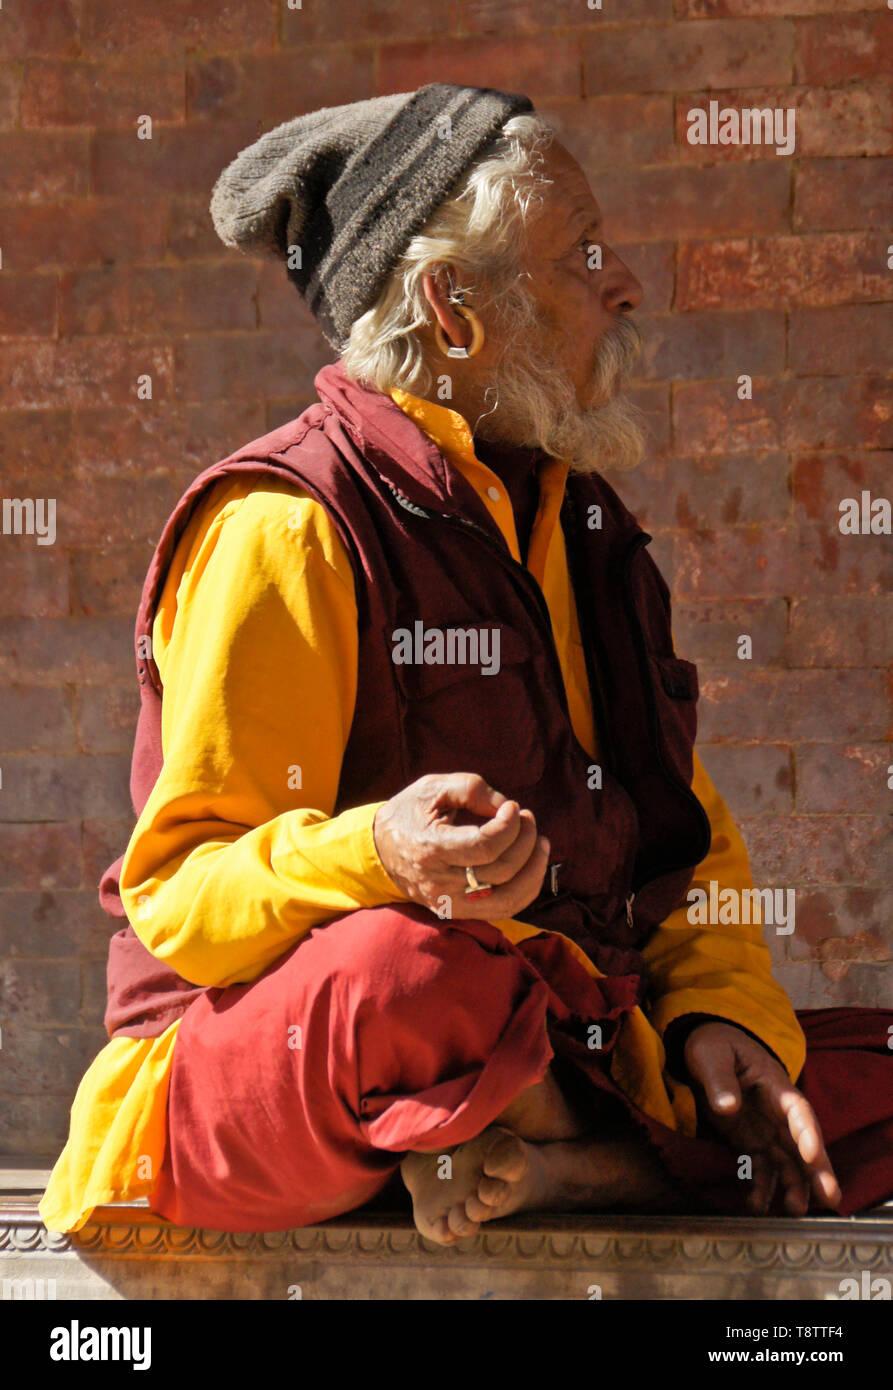 Hindu sadhu (holy man) meditating in Durbar Square, Kathmandu, Nepal - Stock Image